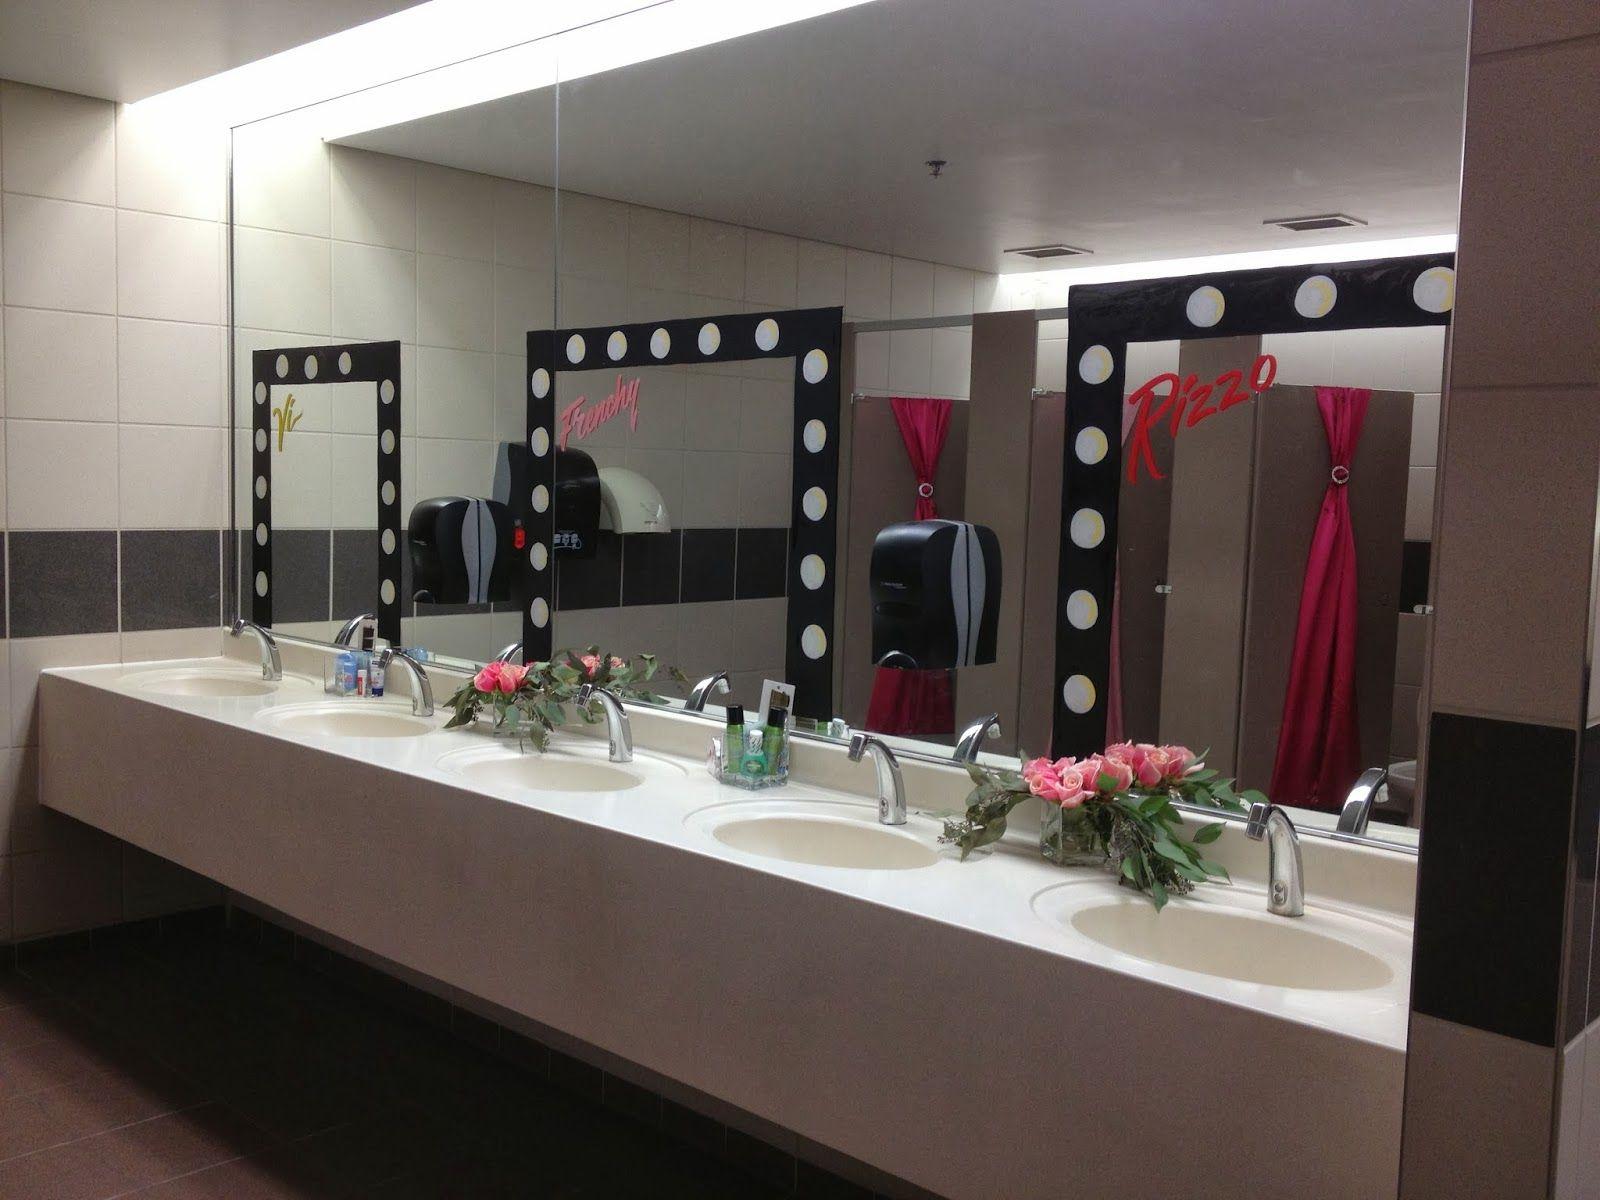 Kleur design reuni bathroom lighting mirror and